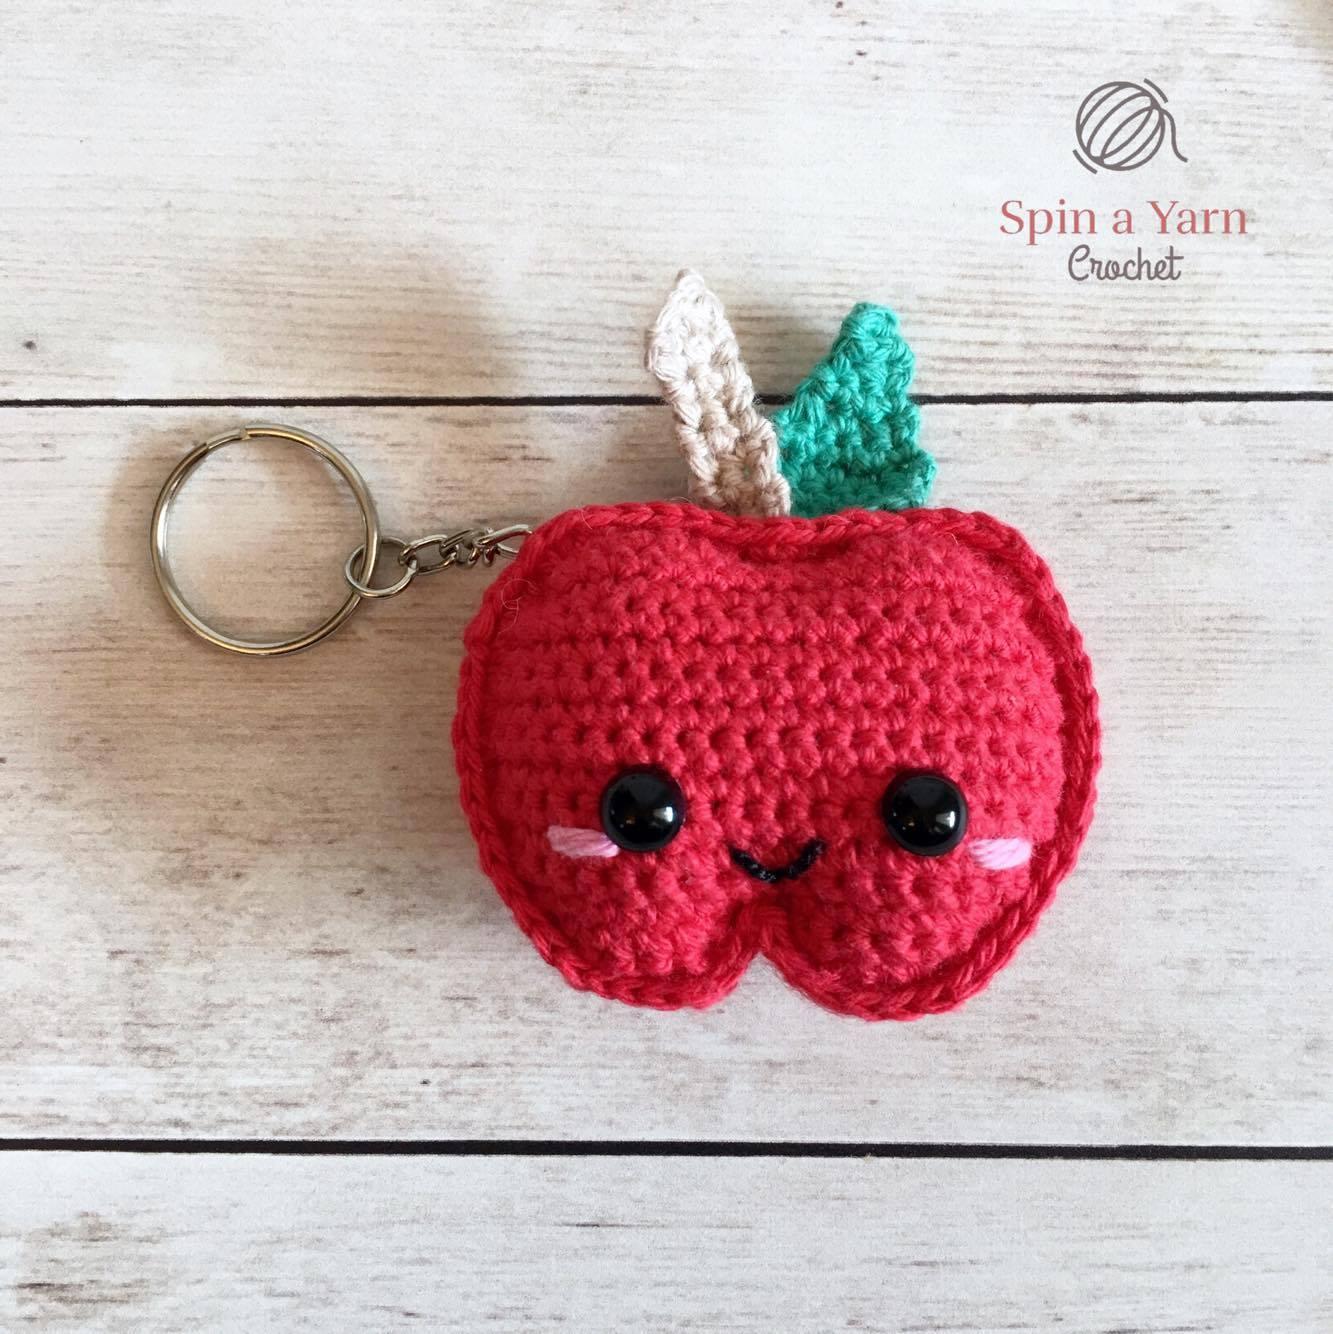 Cute and Fun Keychain Crochet Patterns Free | 1334x1333